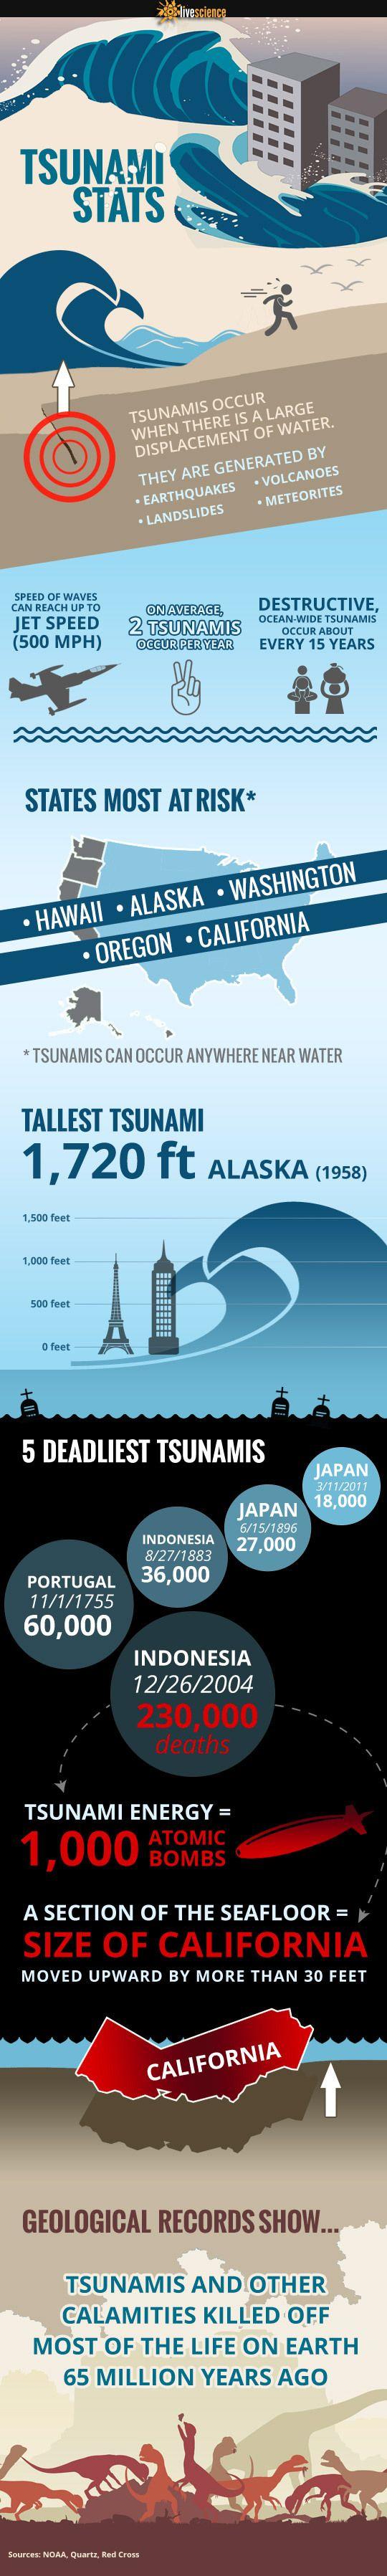 Kentucky Earthquake Map%0A Tsunami Facts You Need to Know